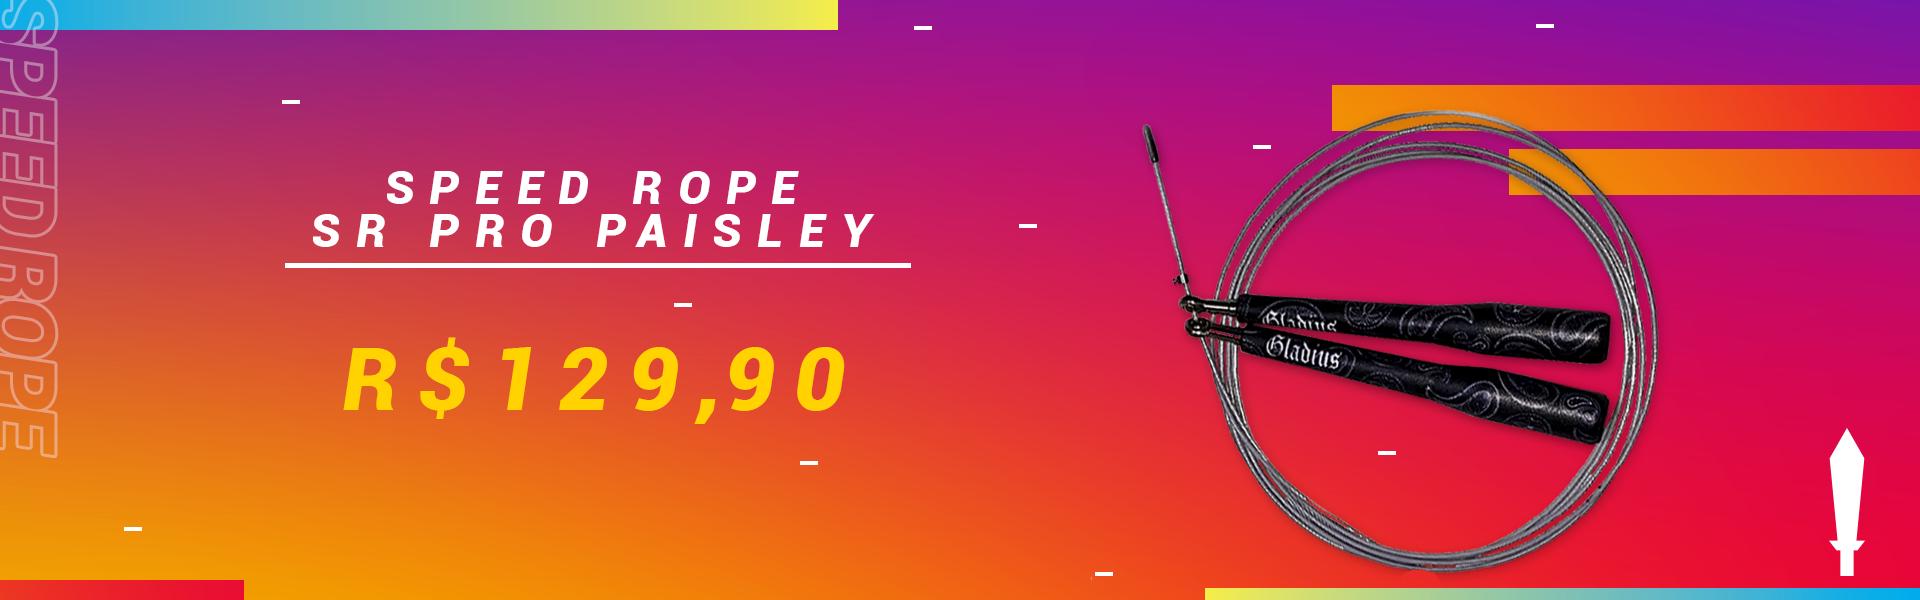 Speed Rope Paisley Promo